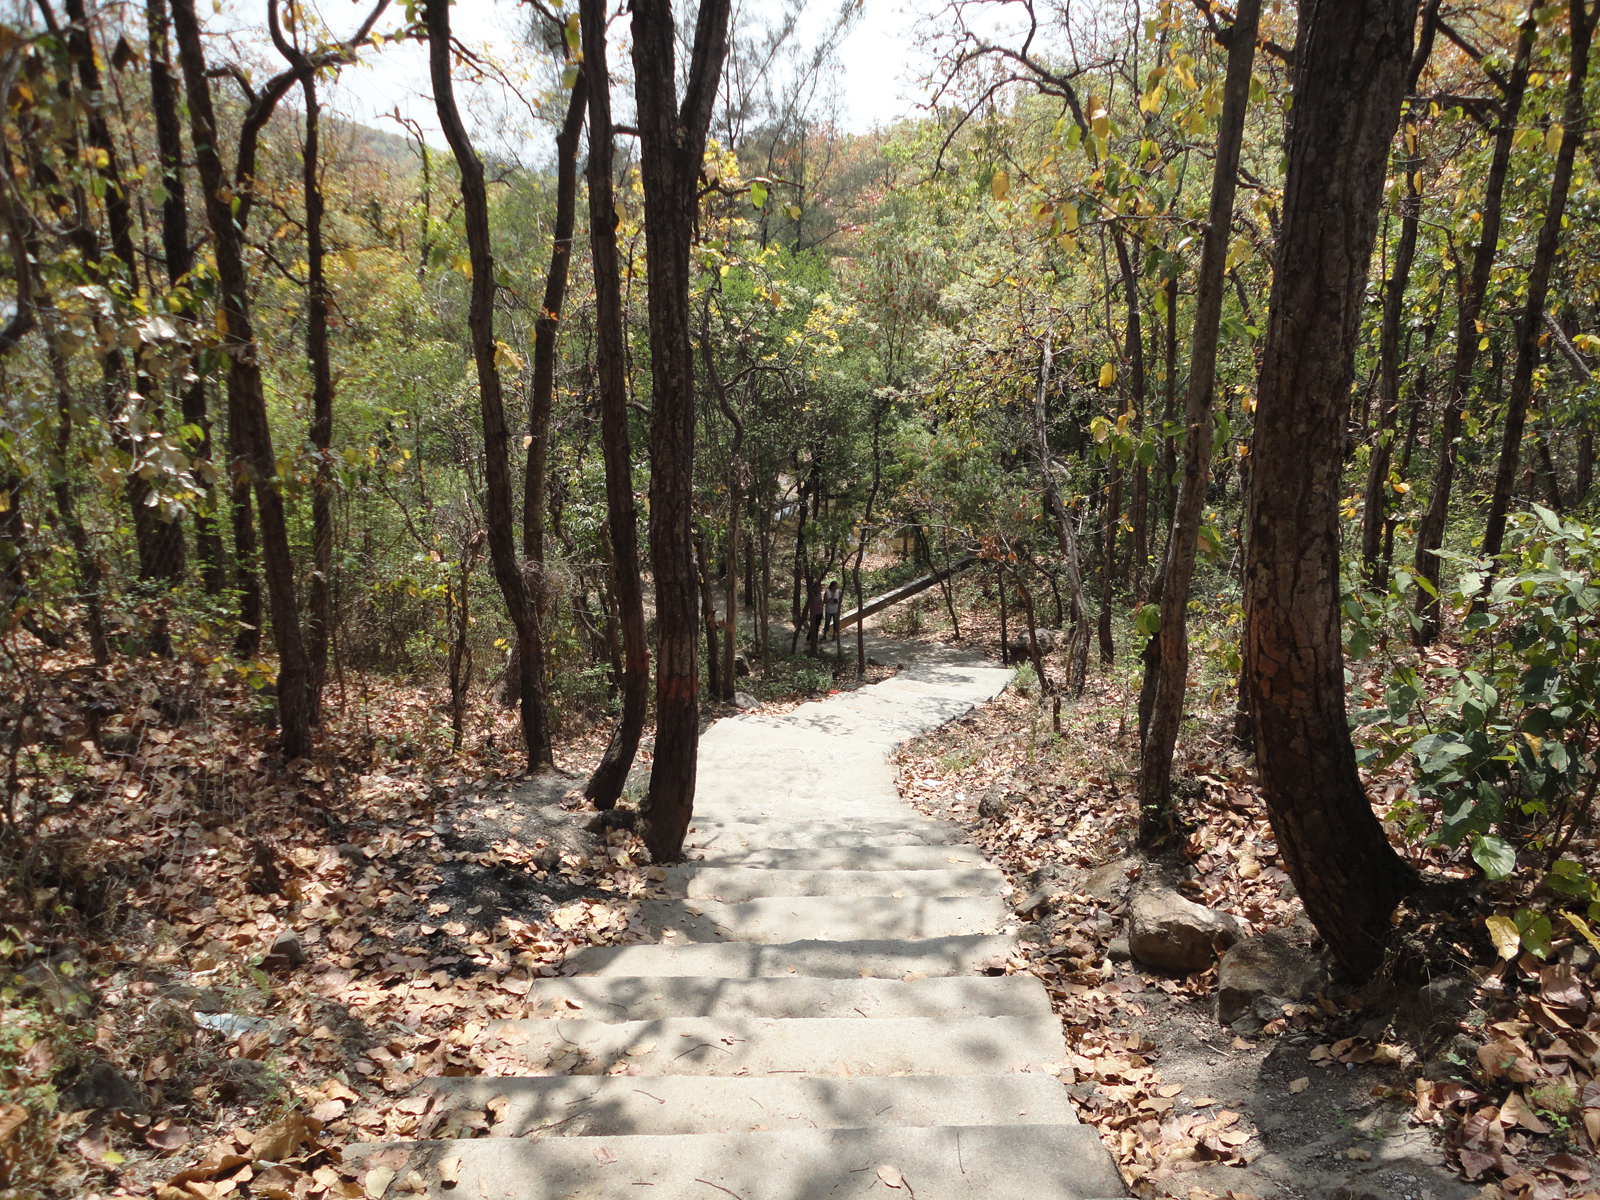 ghumakkar 9 vinay rajput malsi deer park dehradun